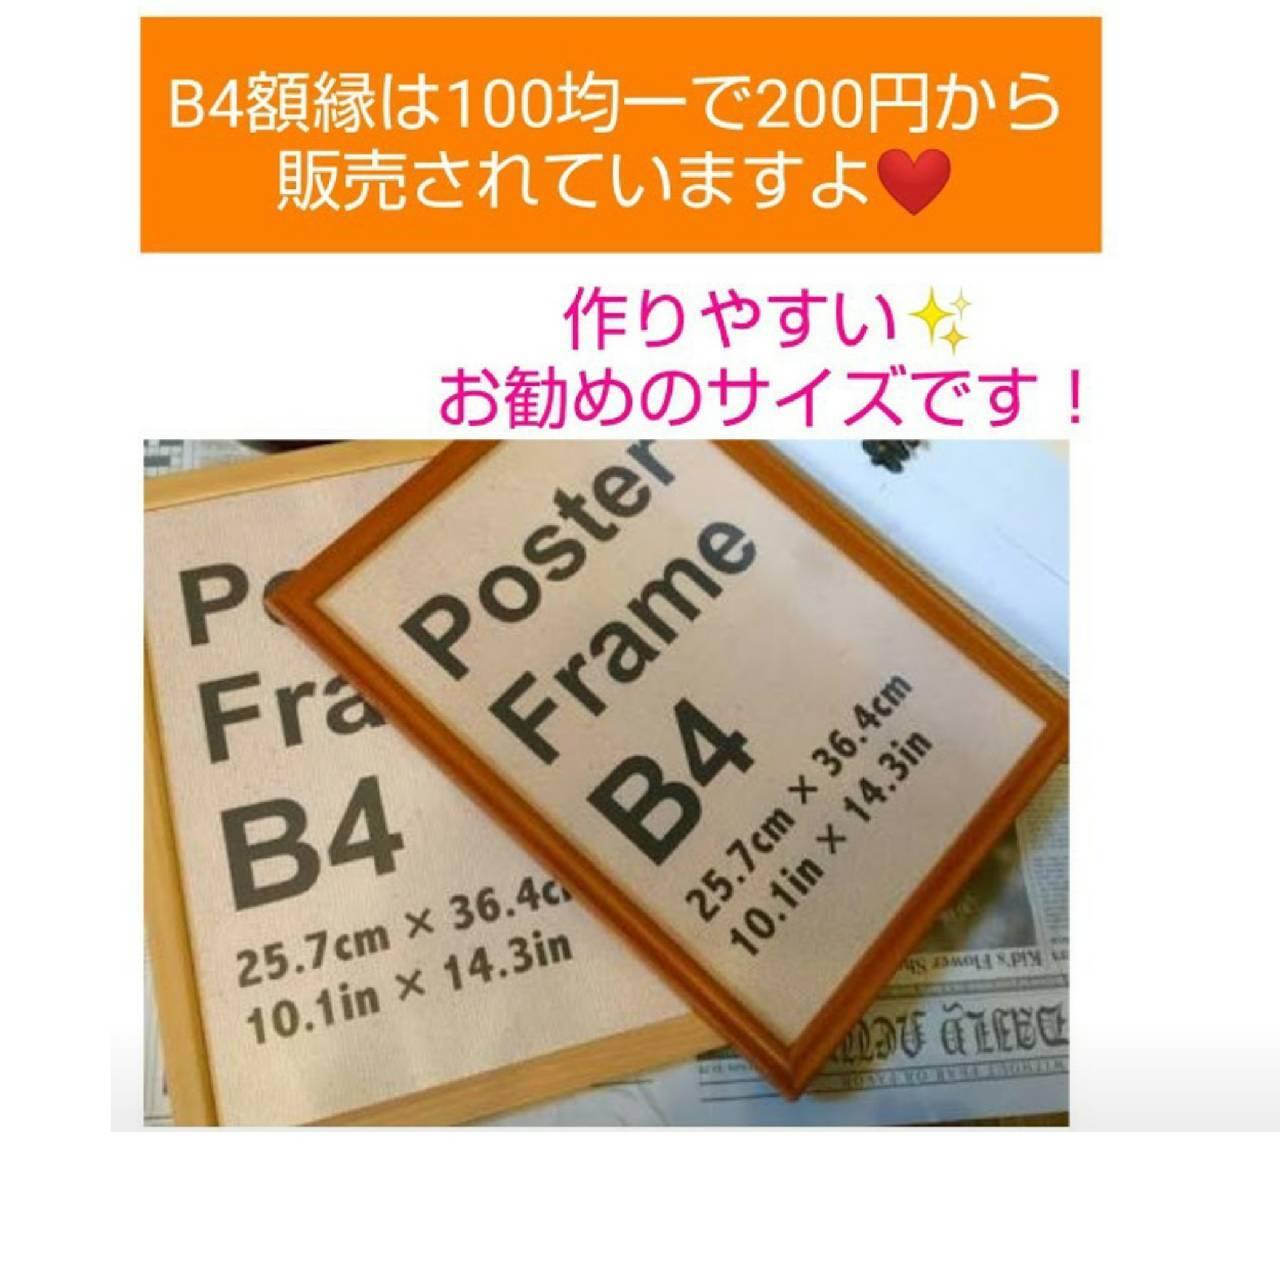 B4:四角【s11397】フルダイヤモンドアート✨